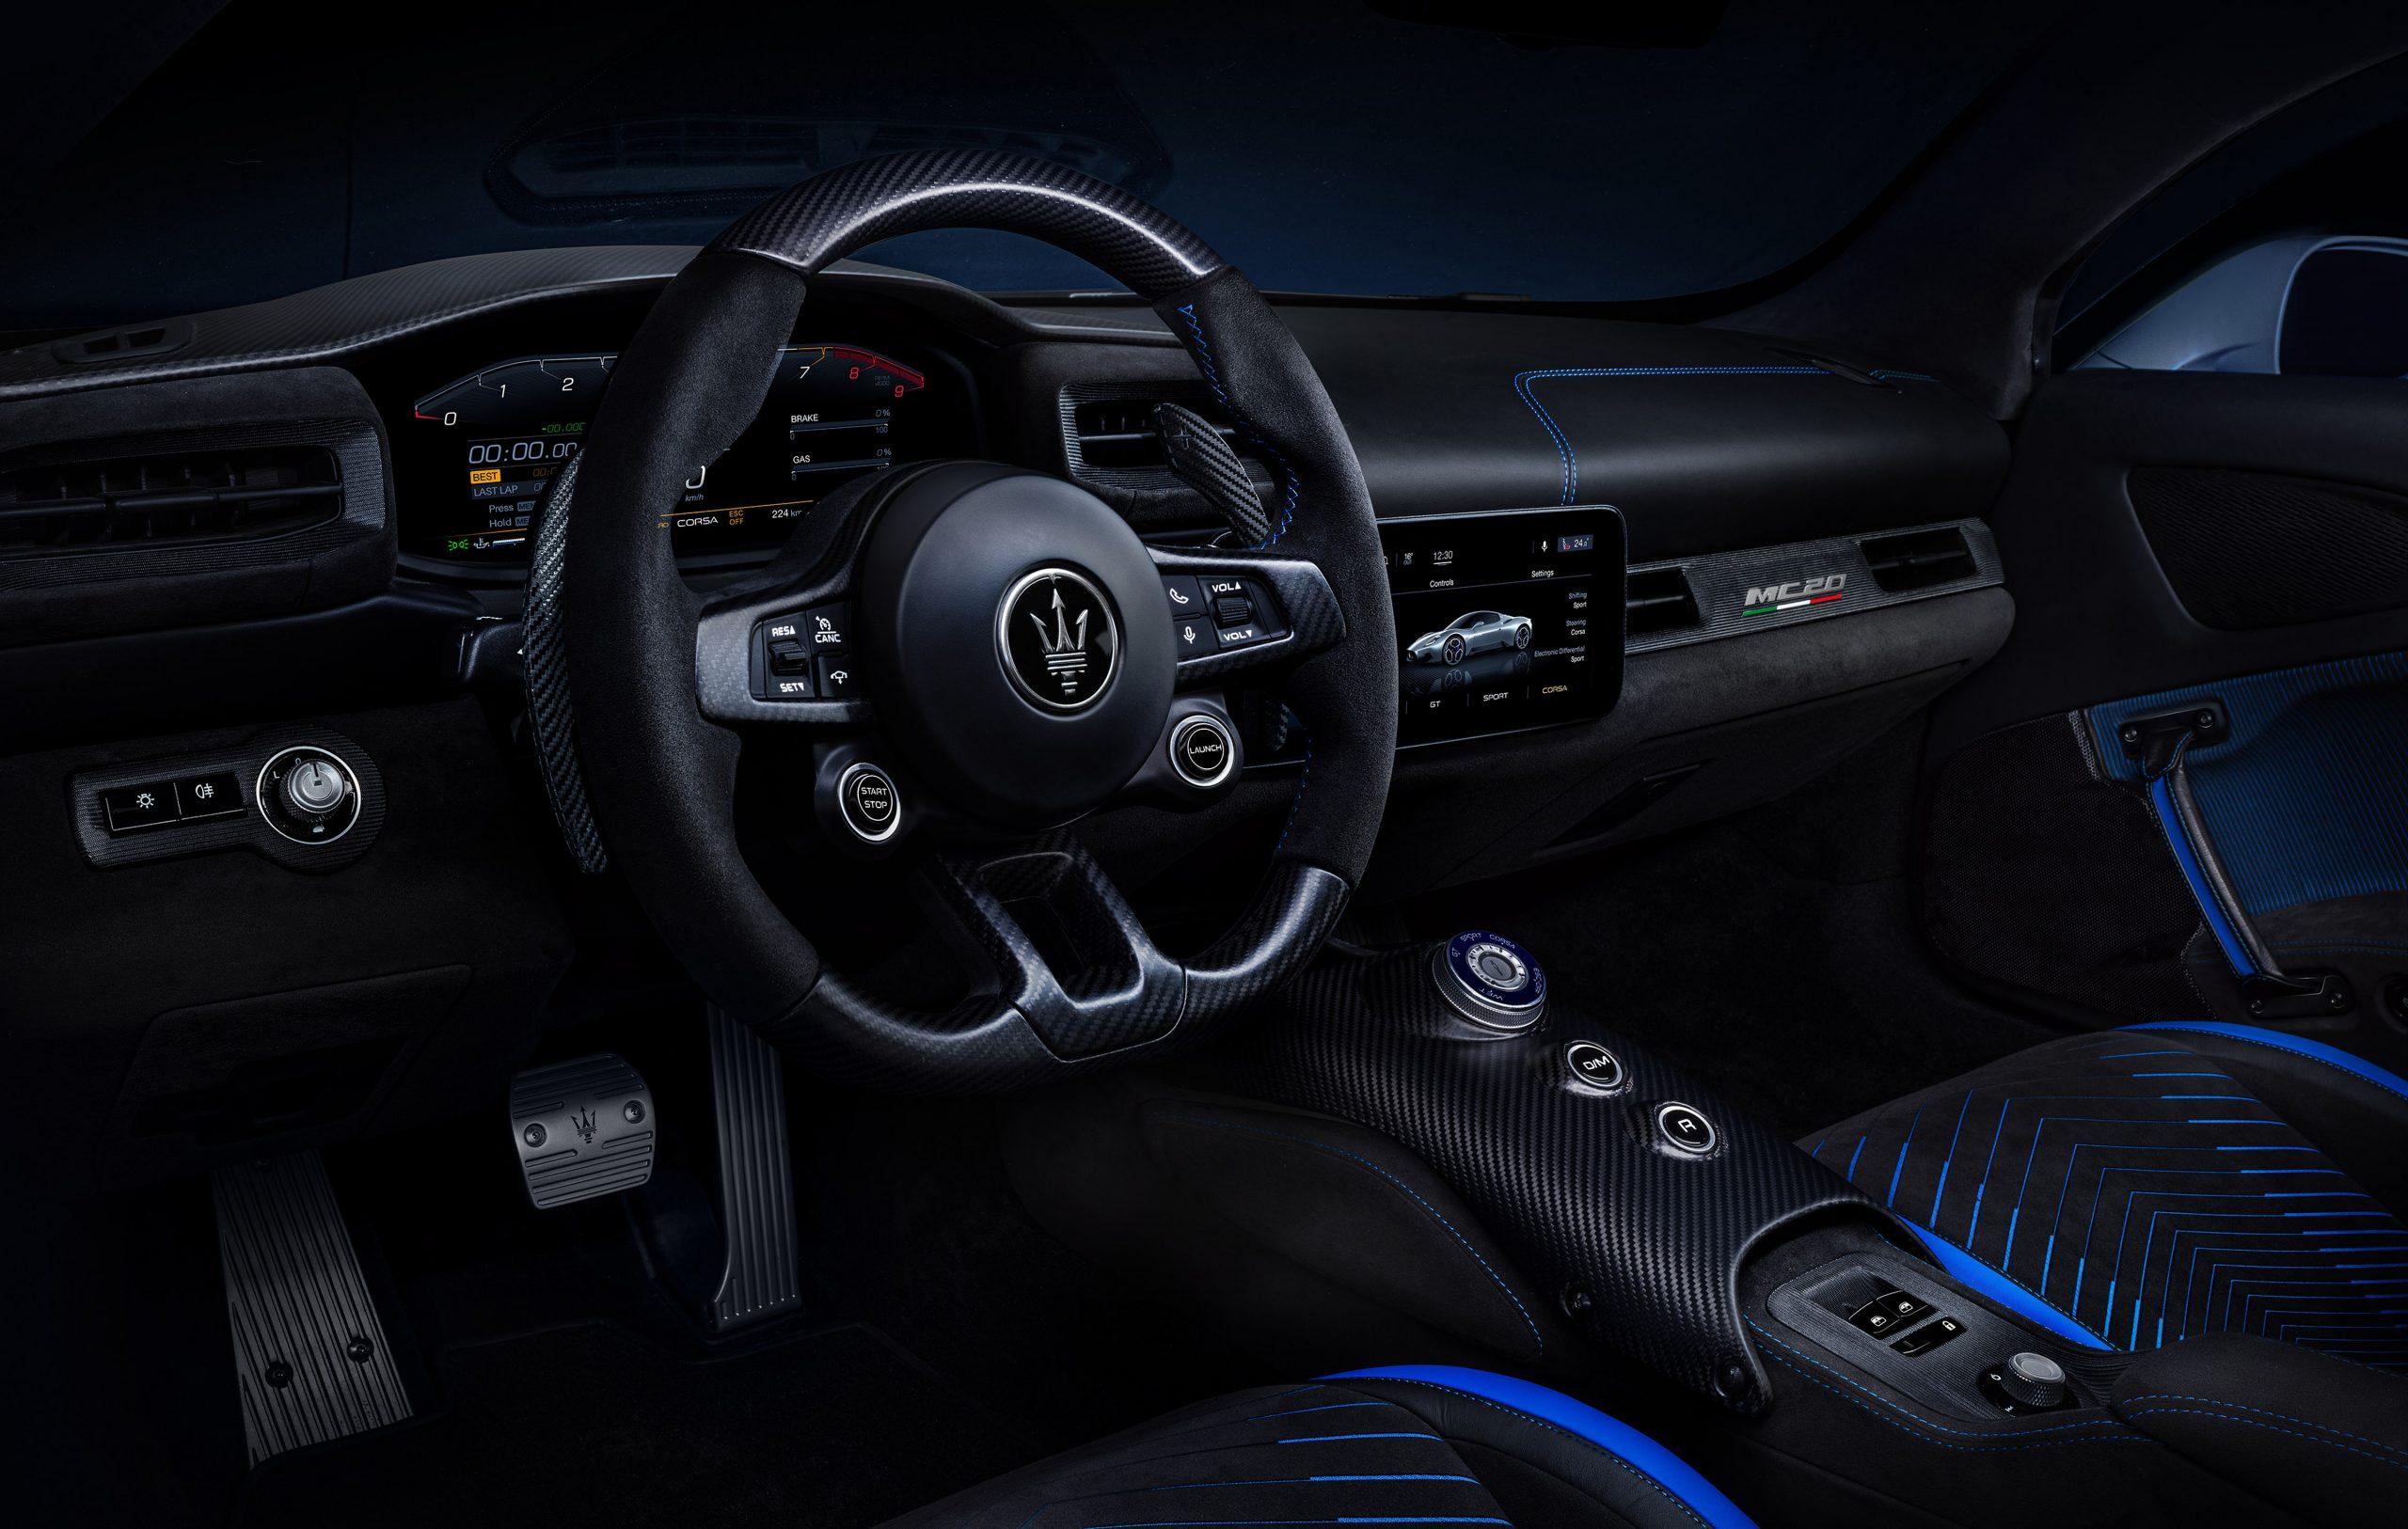 Courtesy: Maserati SPA